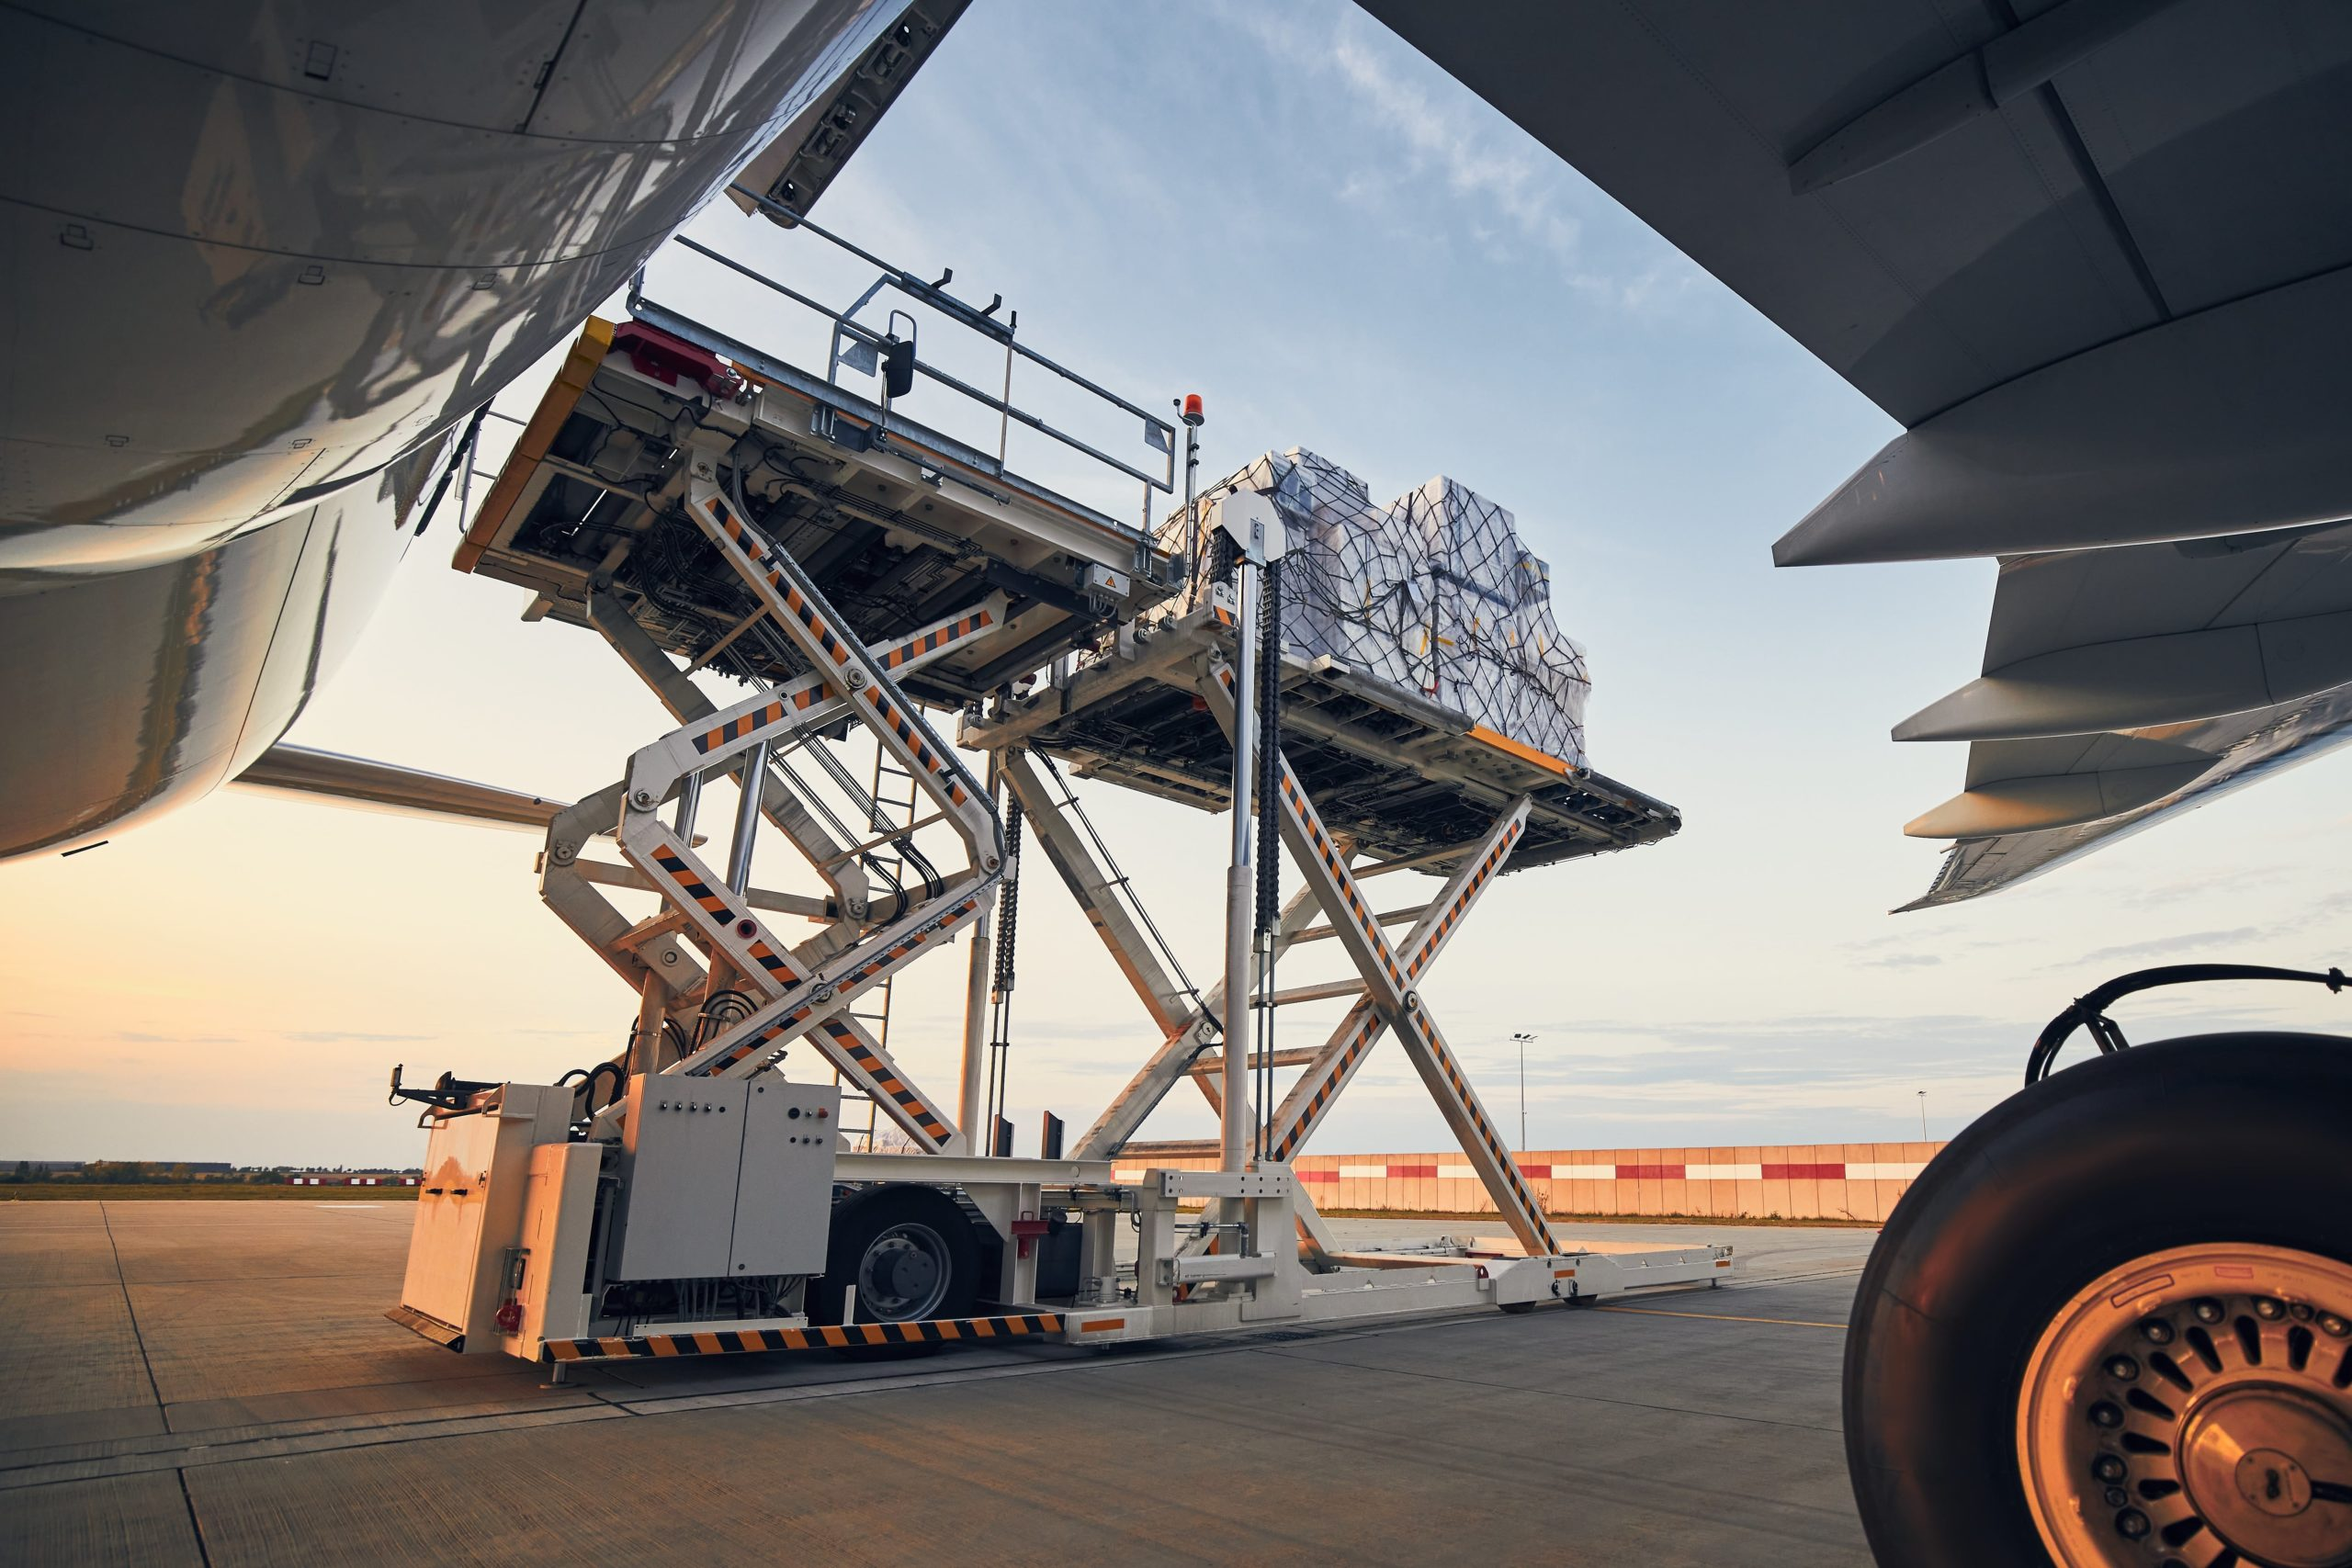 Air Freight services Dorset